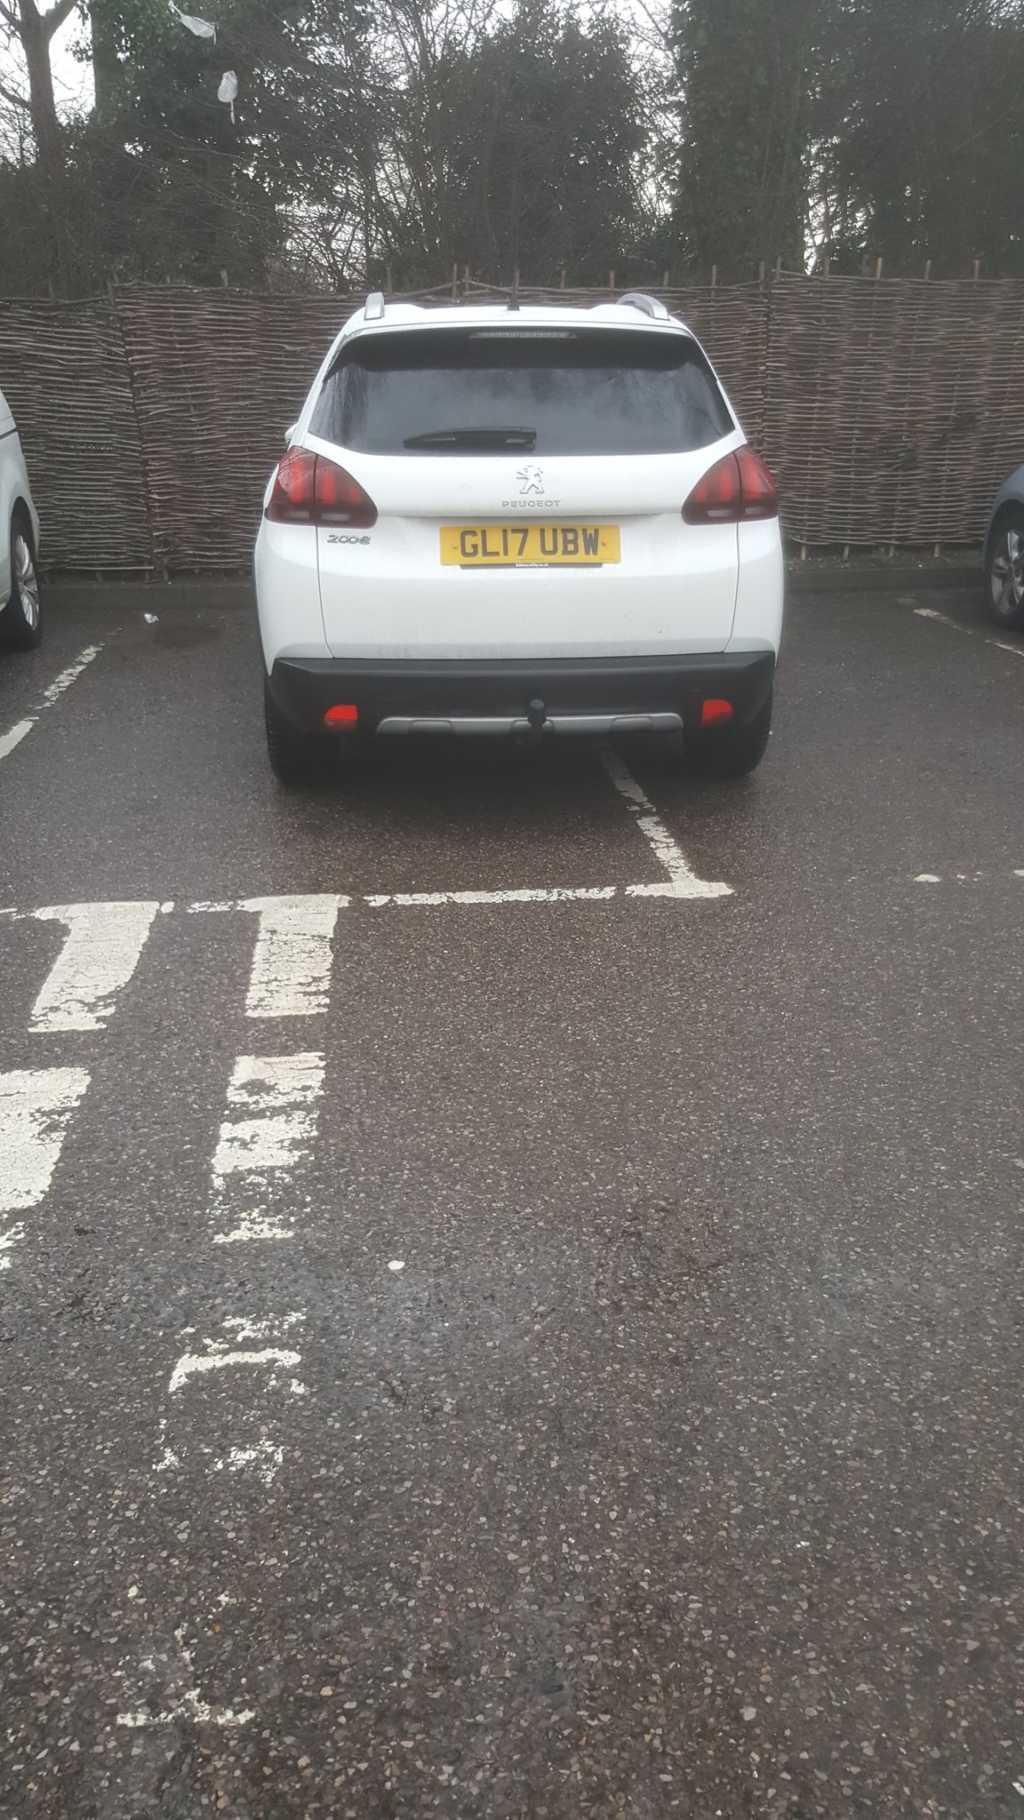 GL17 UBW displaying crap parking